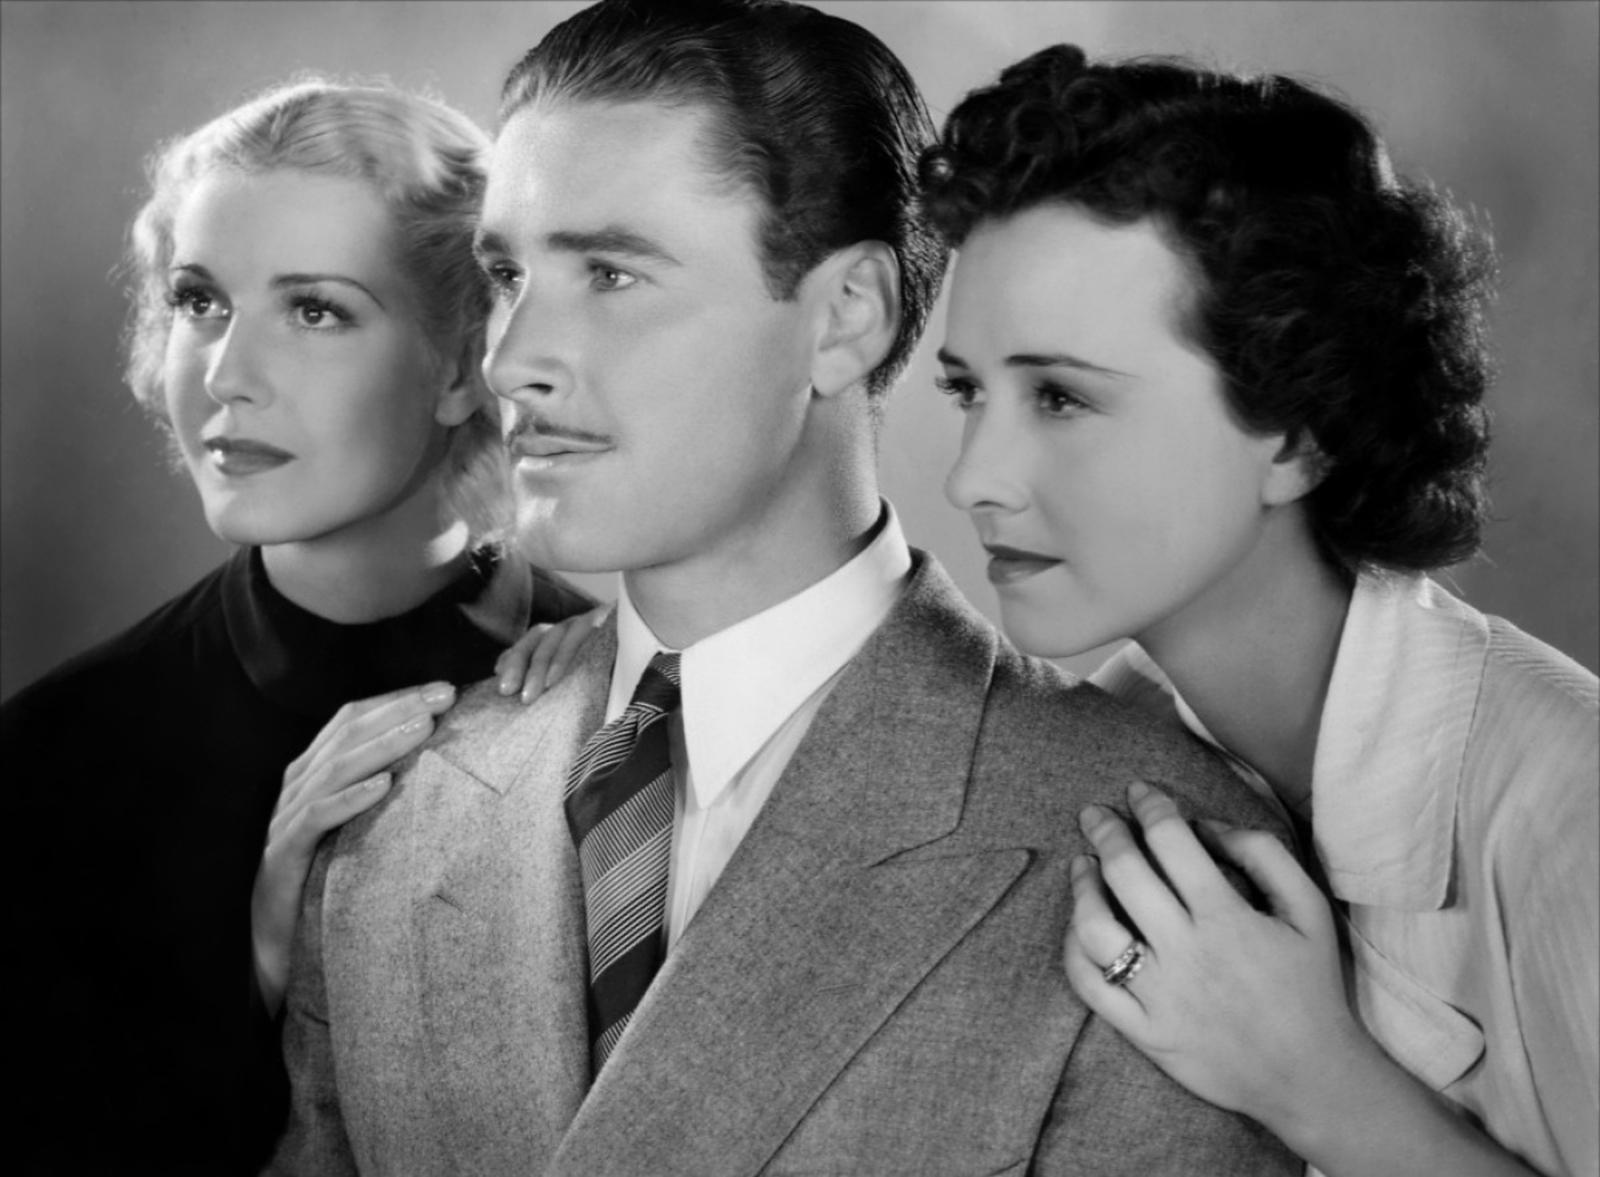 Anita Louise, Errol Flynn, Margaret Lindsay